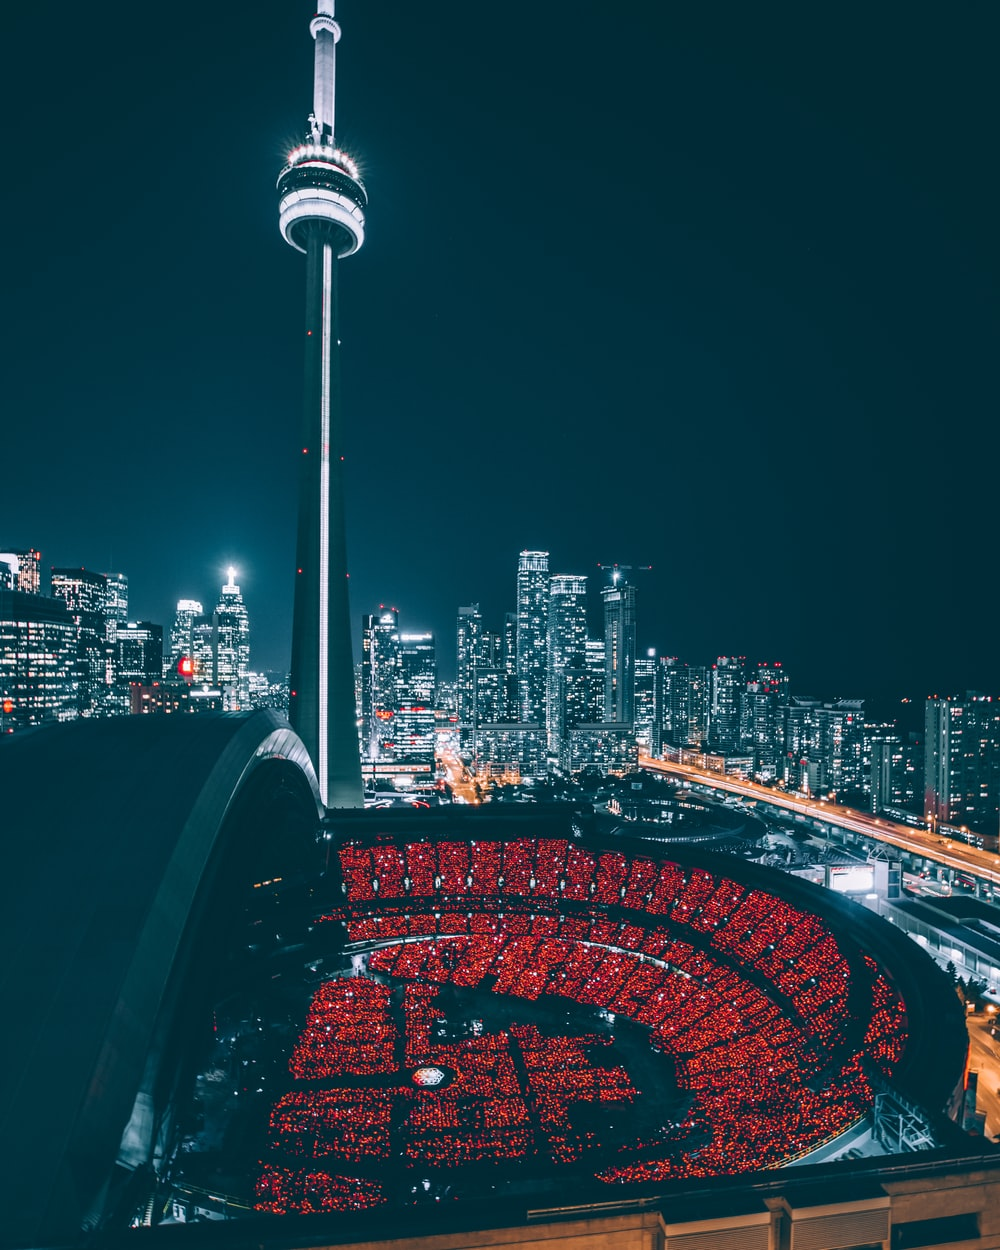 CN Tower at nighttime